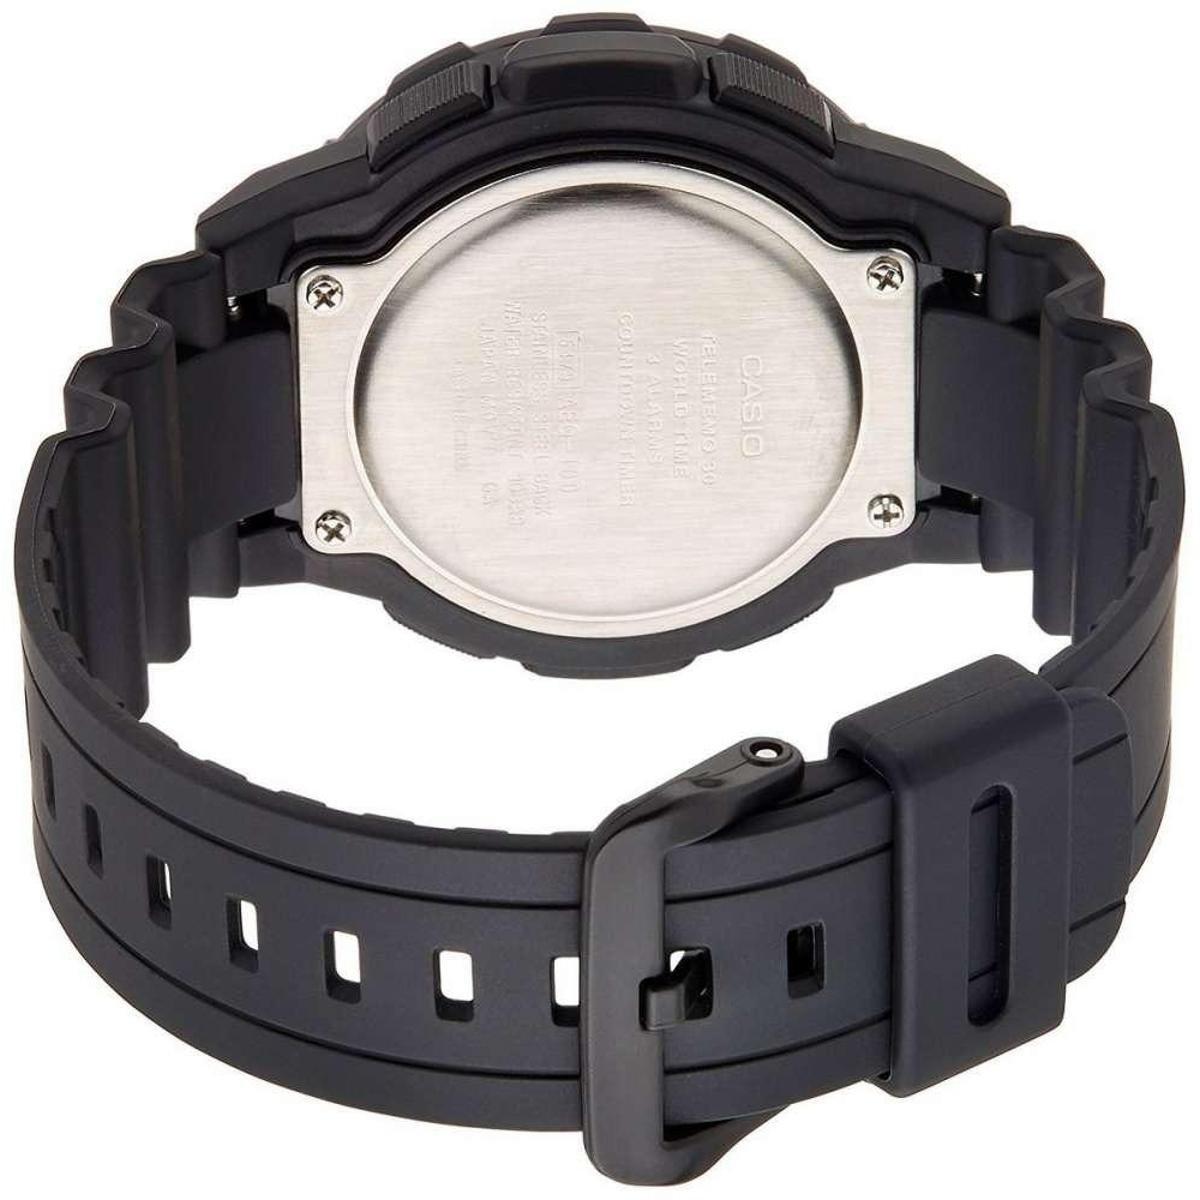 6acb3c696b6 Relógio Casio Aeq-100w-1bvdf Masculino - Compre Agora